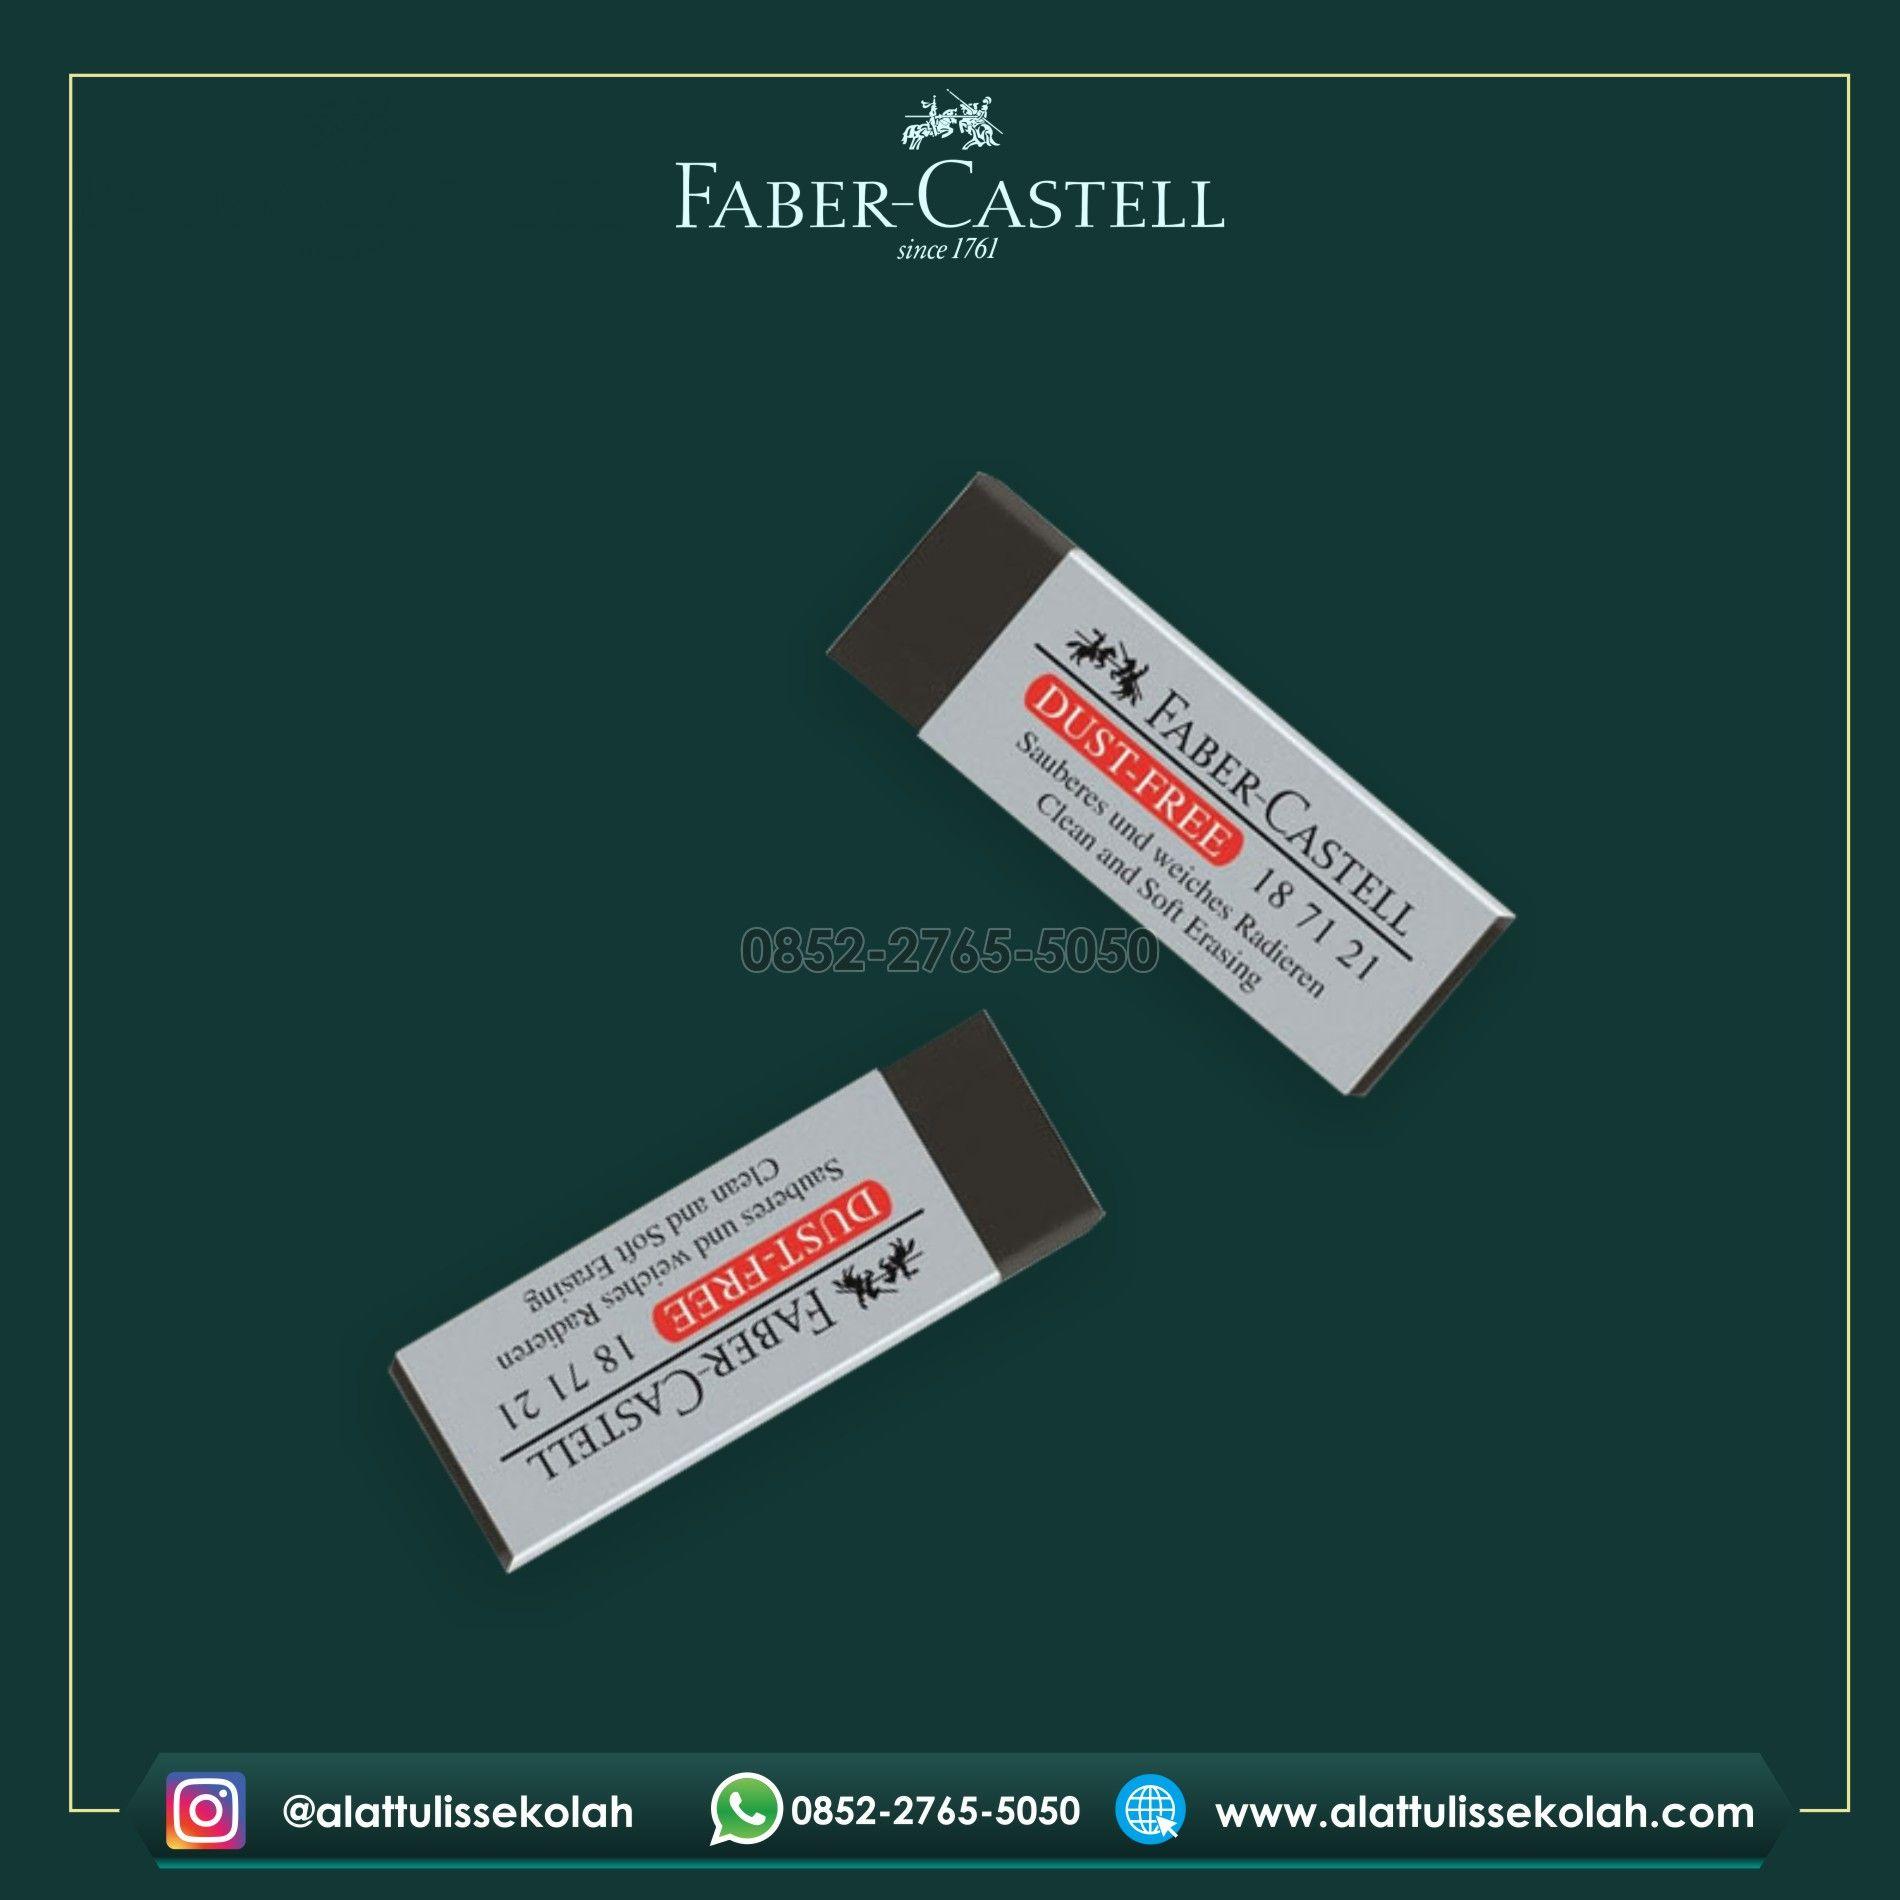 Alat Tulis Sekolah 0852 2765 5050 Penghapu Pensil Faber Castell Info Hub Tlp Sms Wa 0852 2765 5050 Fast Respon Fabercastell Al Dengan Gambar Sekolah Tulisan Instagram